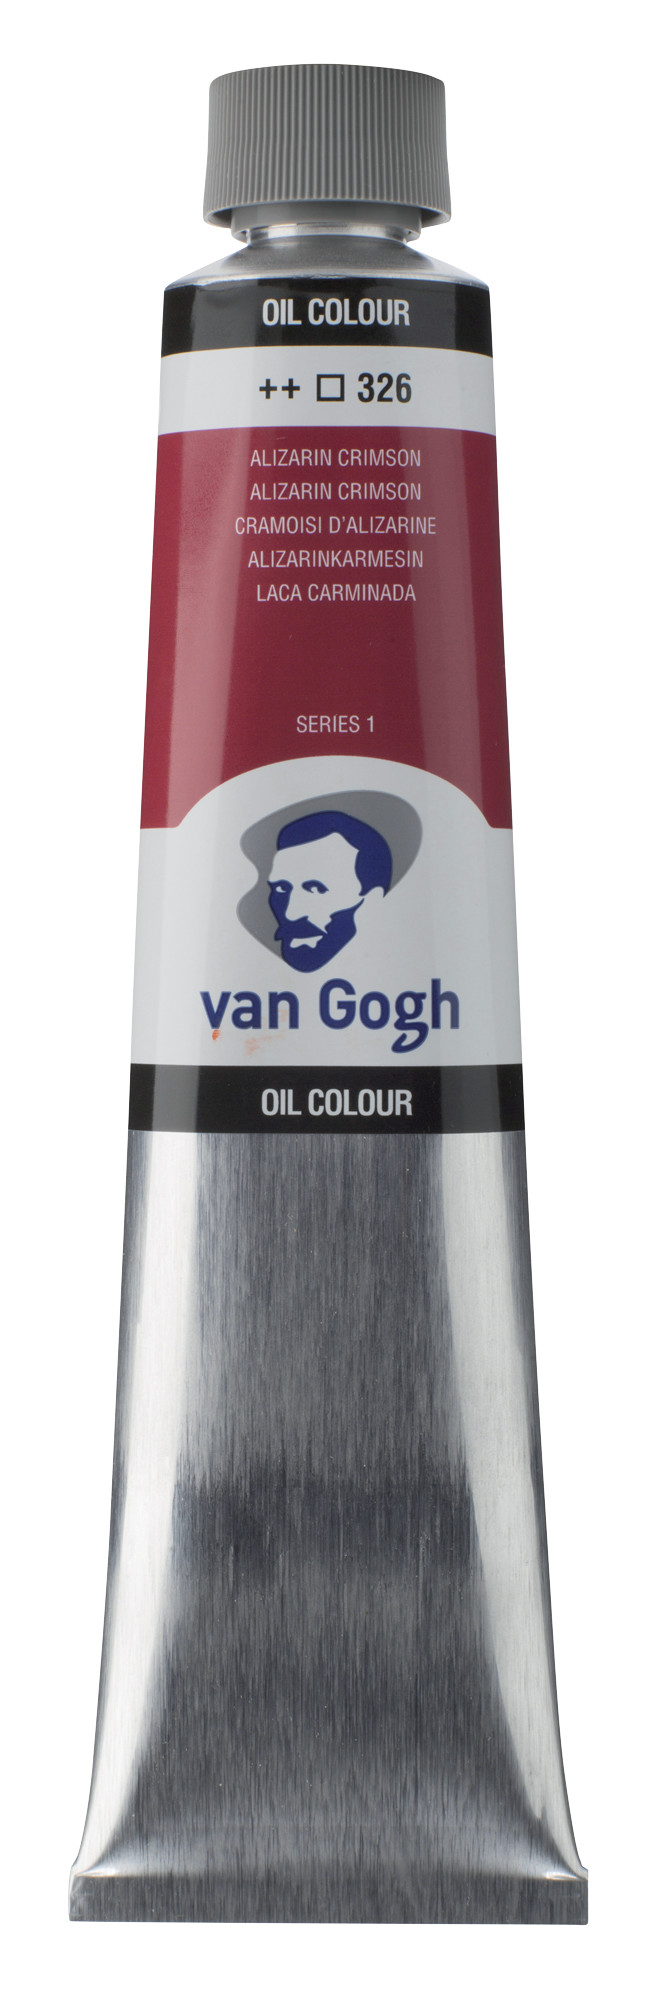 Van Gogh Oil Colour Tube 200 ml Alizarin Crimson 326